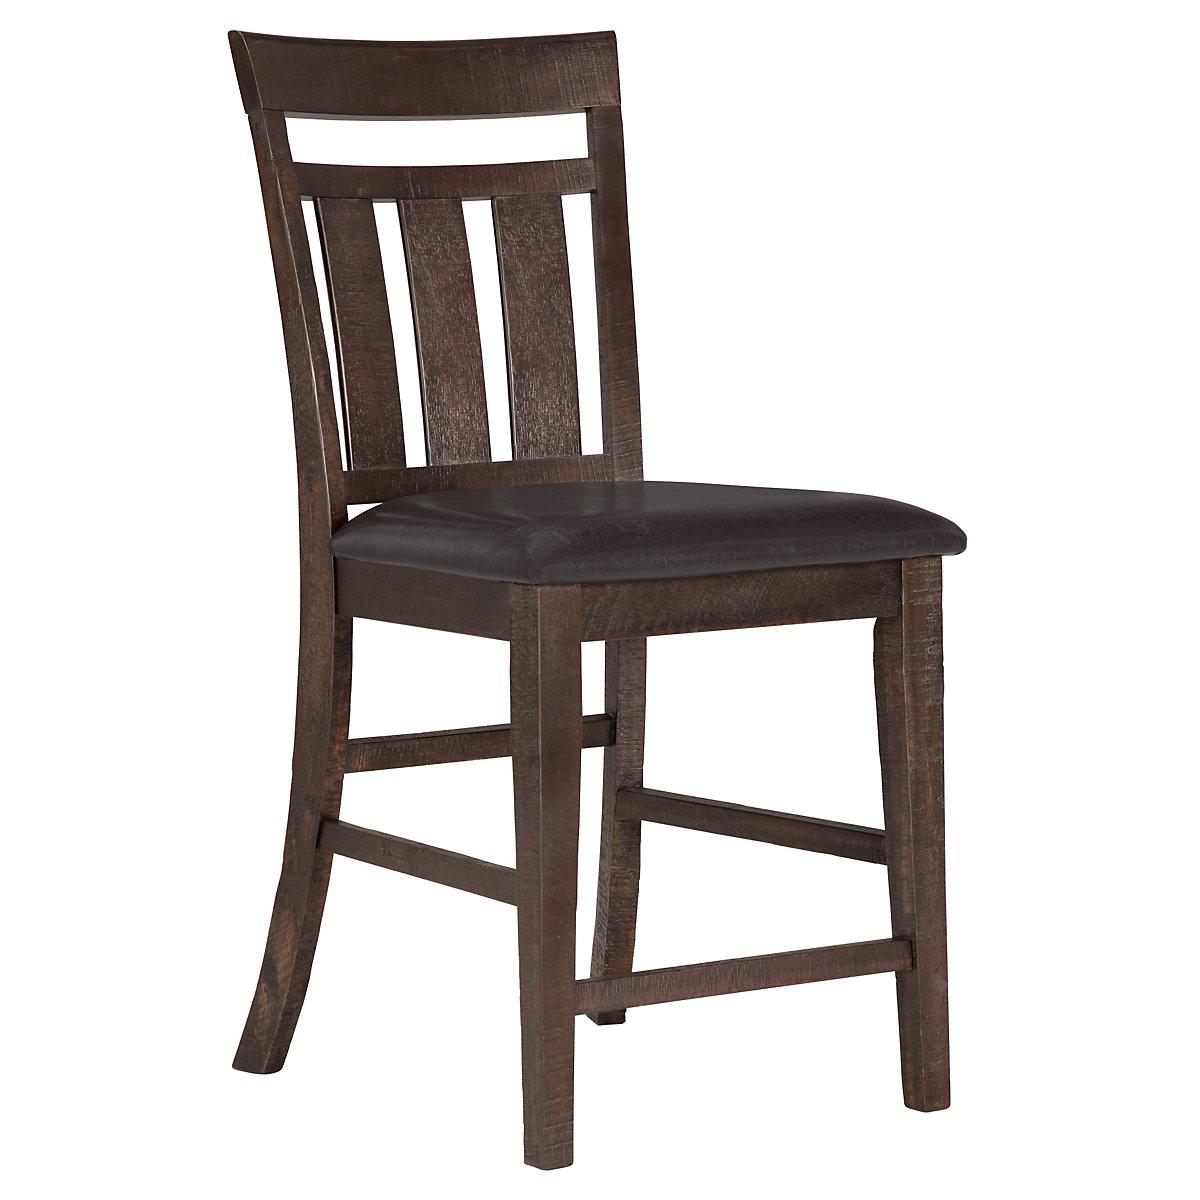 "Kona Grove Dark Tone Wood 24"" Wood Barstool"